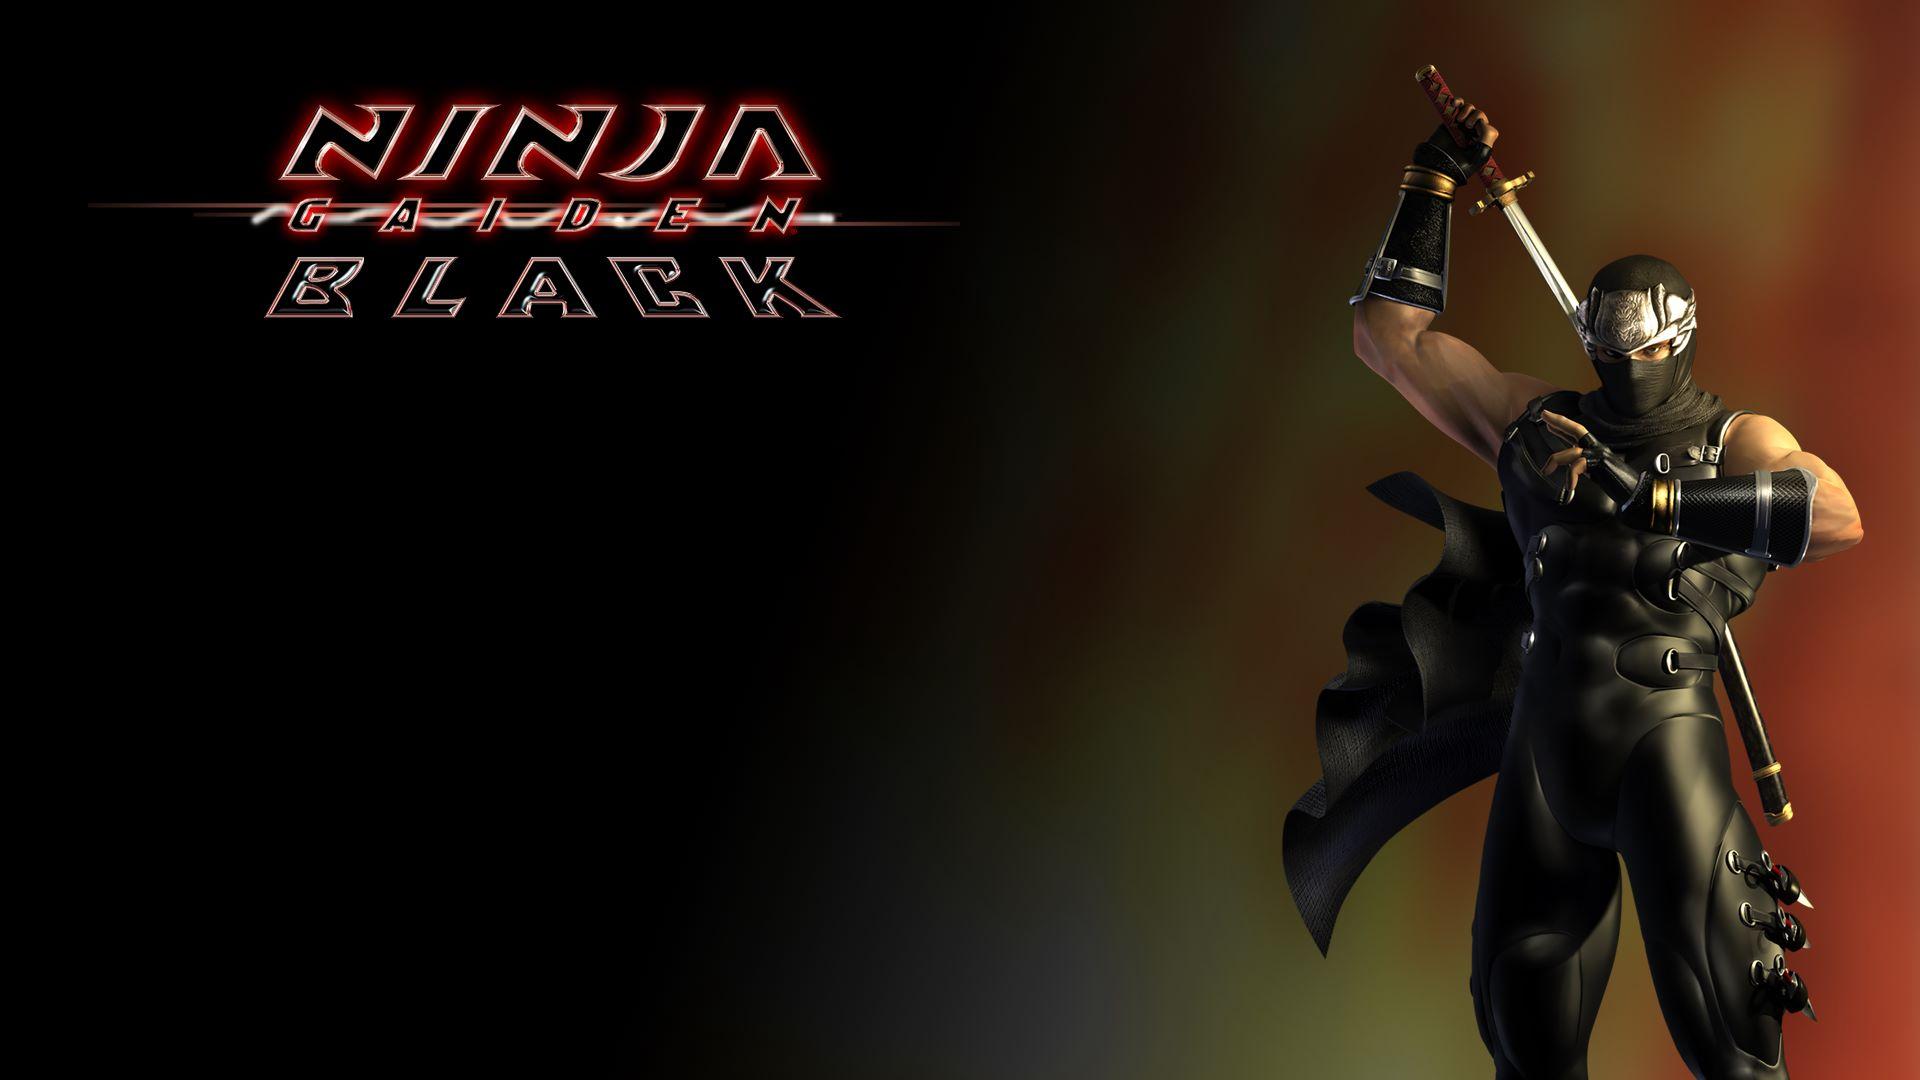 Buy Ninja Gaiden Black